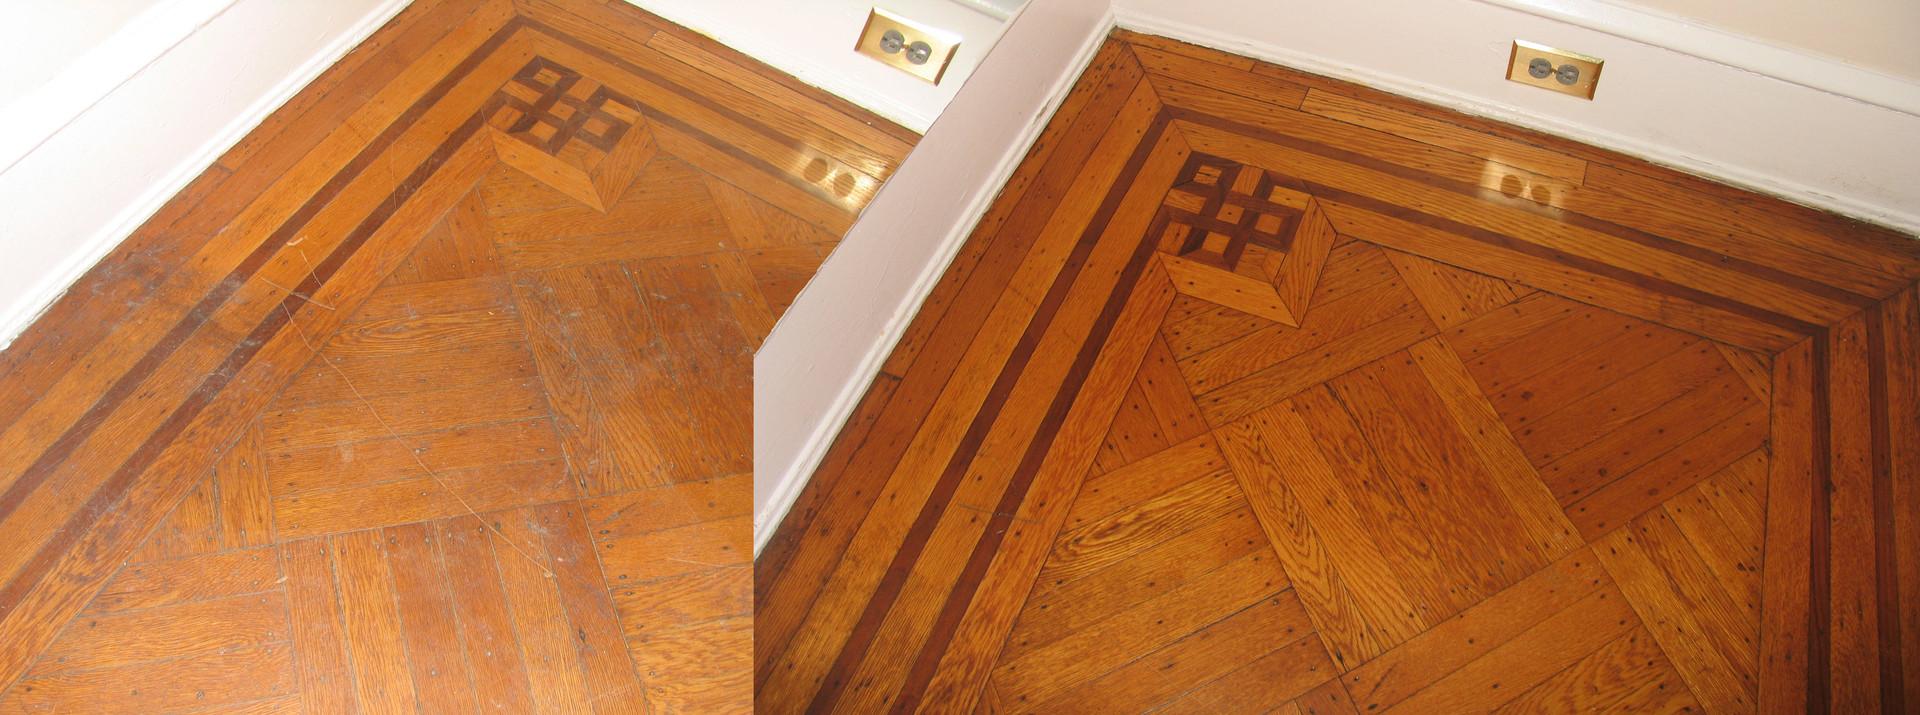 hardwood floor refinishing wilmington delaware of new life floors with sandless wood floor refinishing